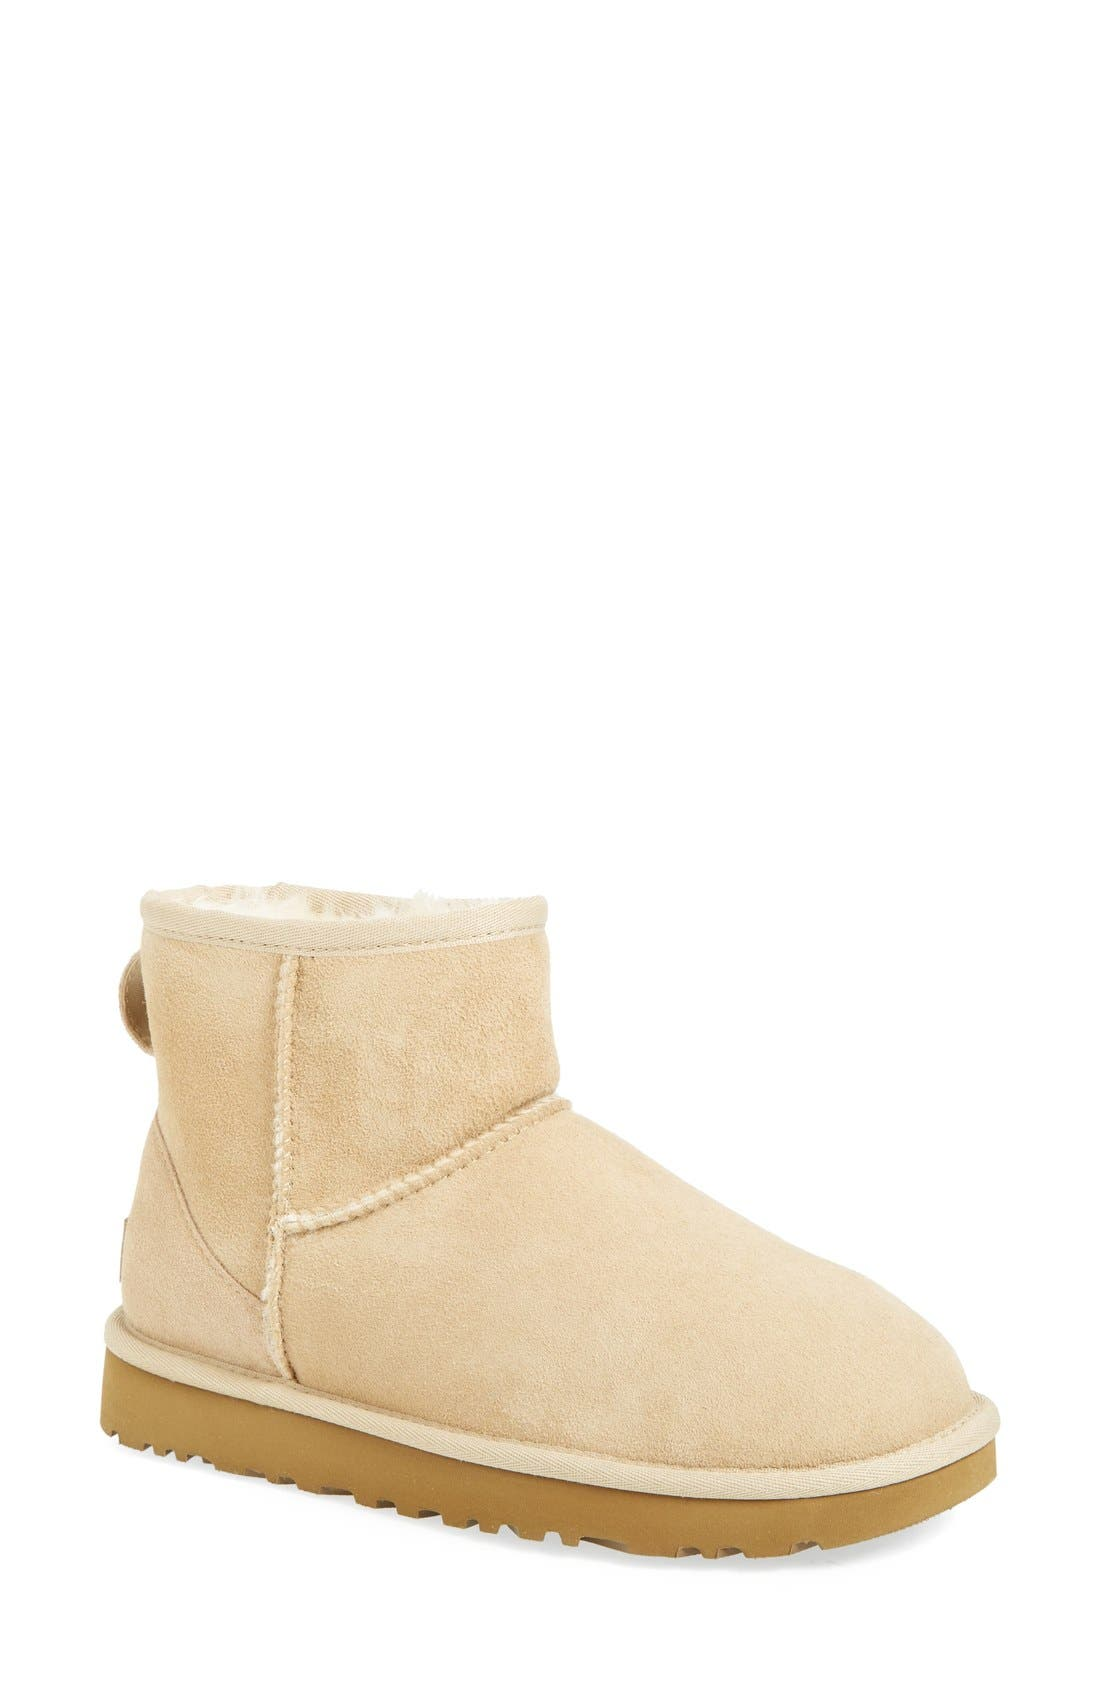 ,                             Classic Mini II Genuine Shearling Lined Boot,                             Main thumbnail 134, color,                             251